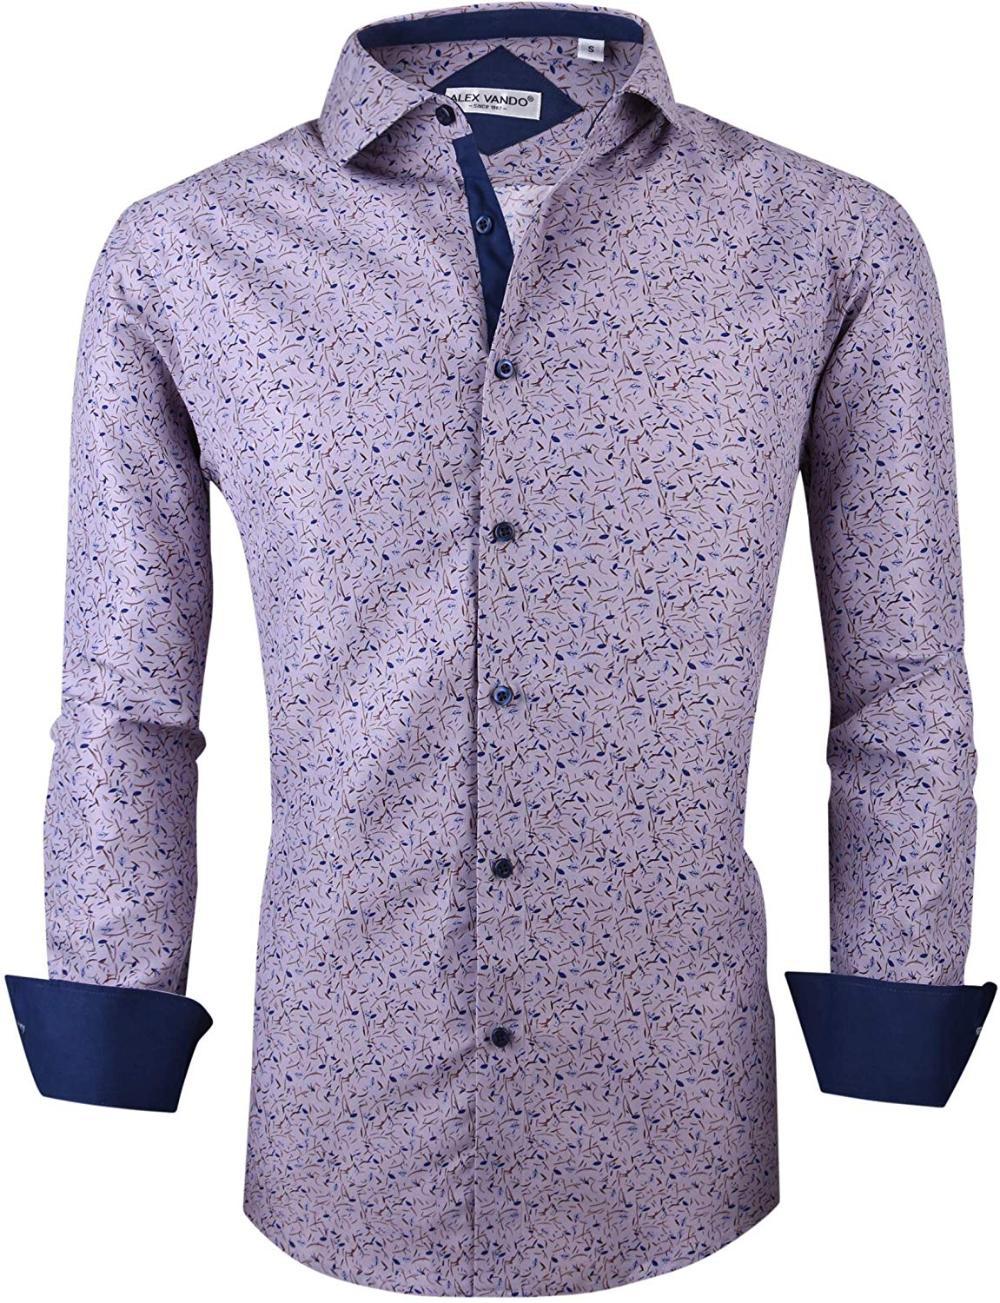 Alex Vando Mens Printed Dress Shirts Long Sleeve Regular Fit Fashion Shirt At Amazon Men S Clothing Store Shirt Dress Printed Dress Shirts Shirt Dress Casual [ 1303 x 1000 Pixel ]